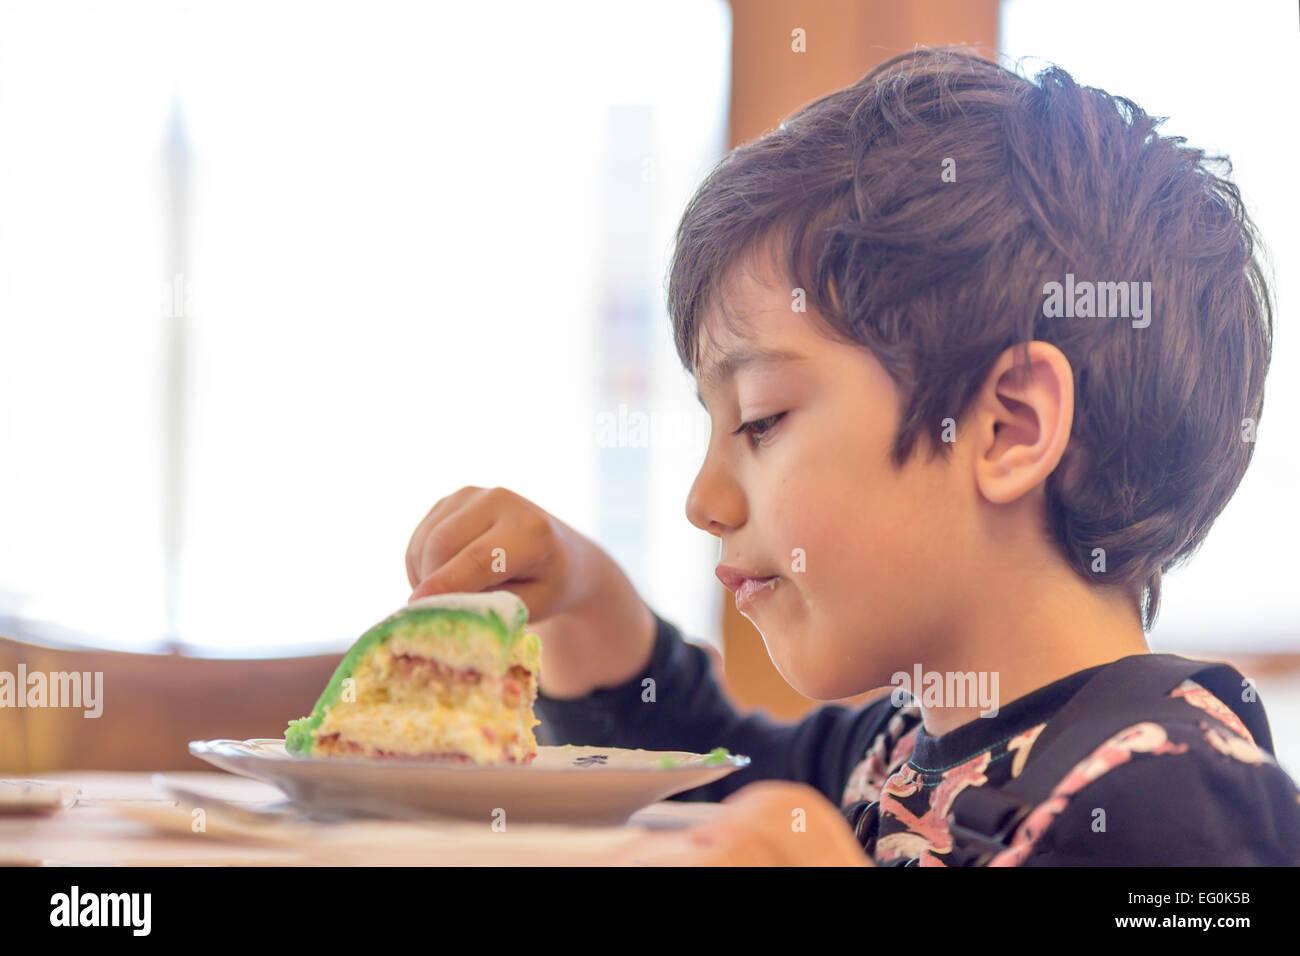 Bulgaria, Sofia, Young boy (4-5) eating cake Stock Photo